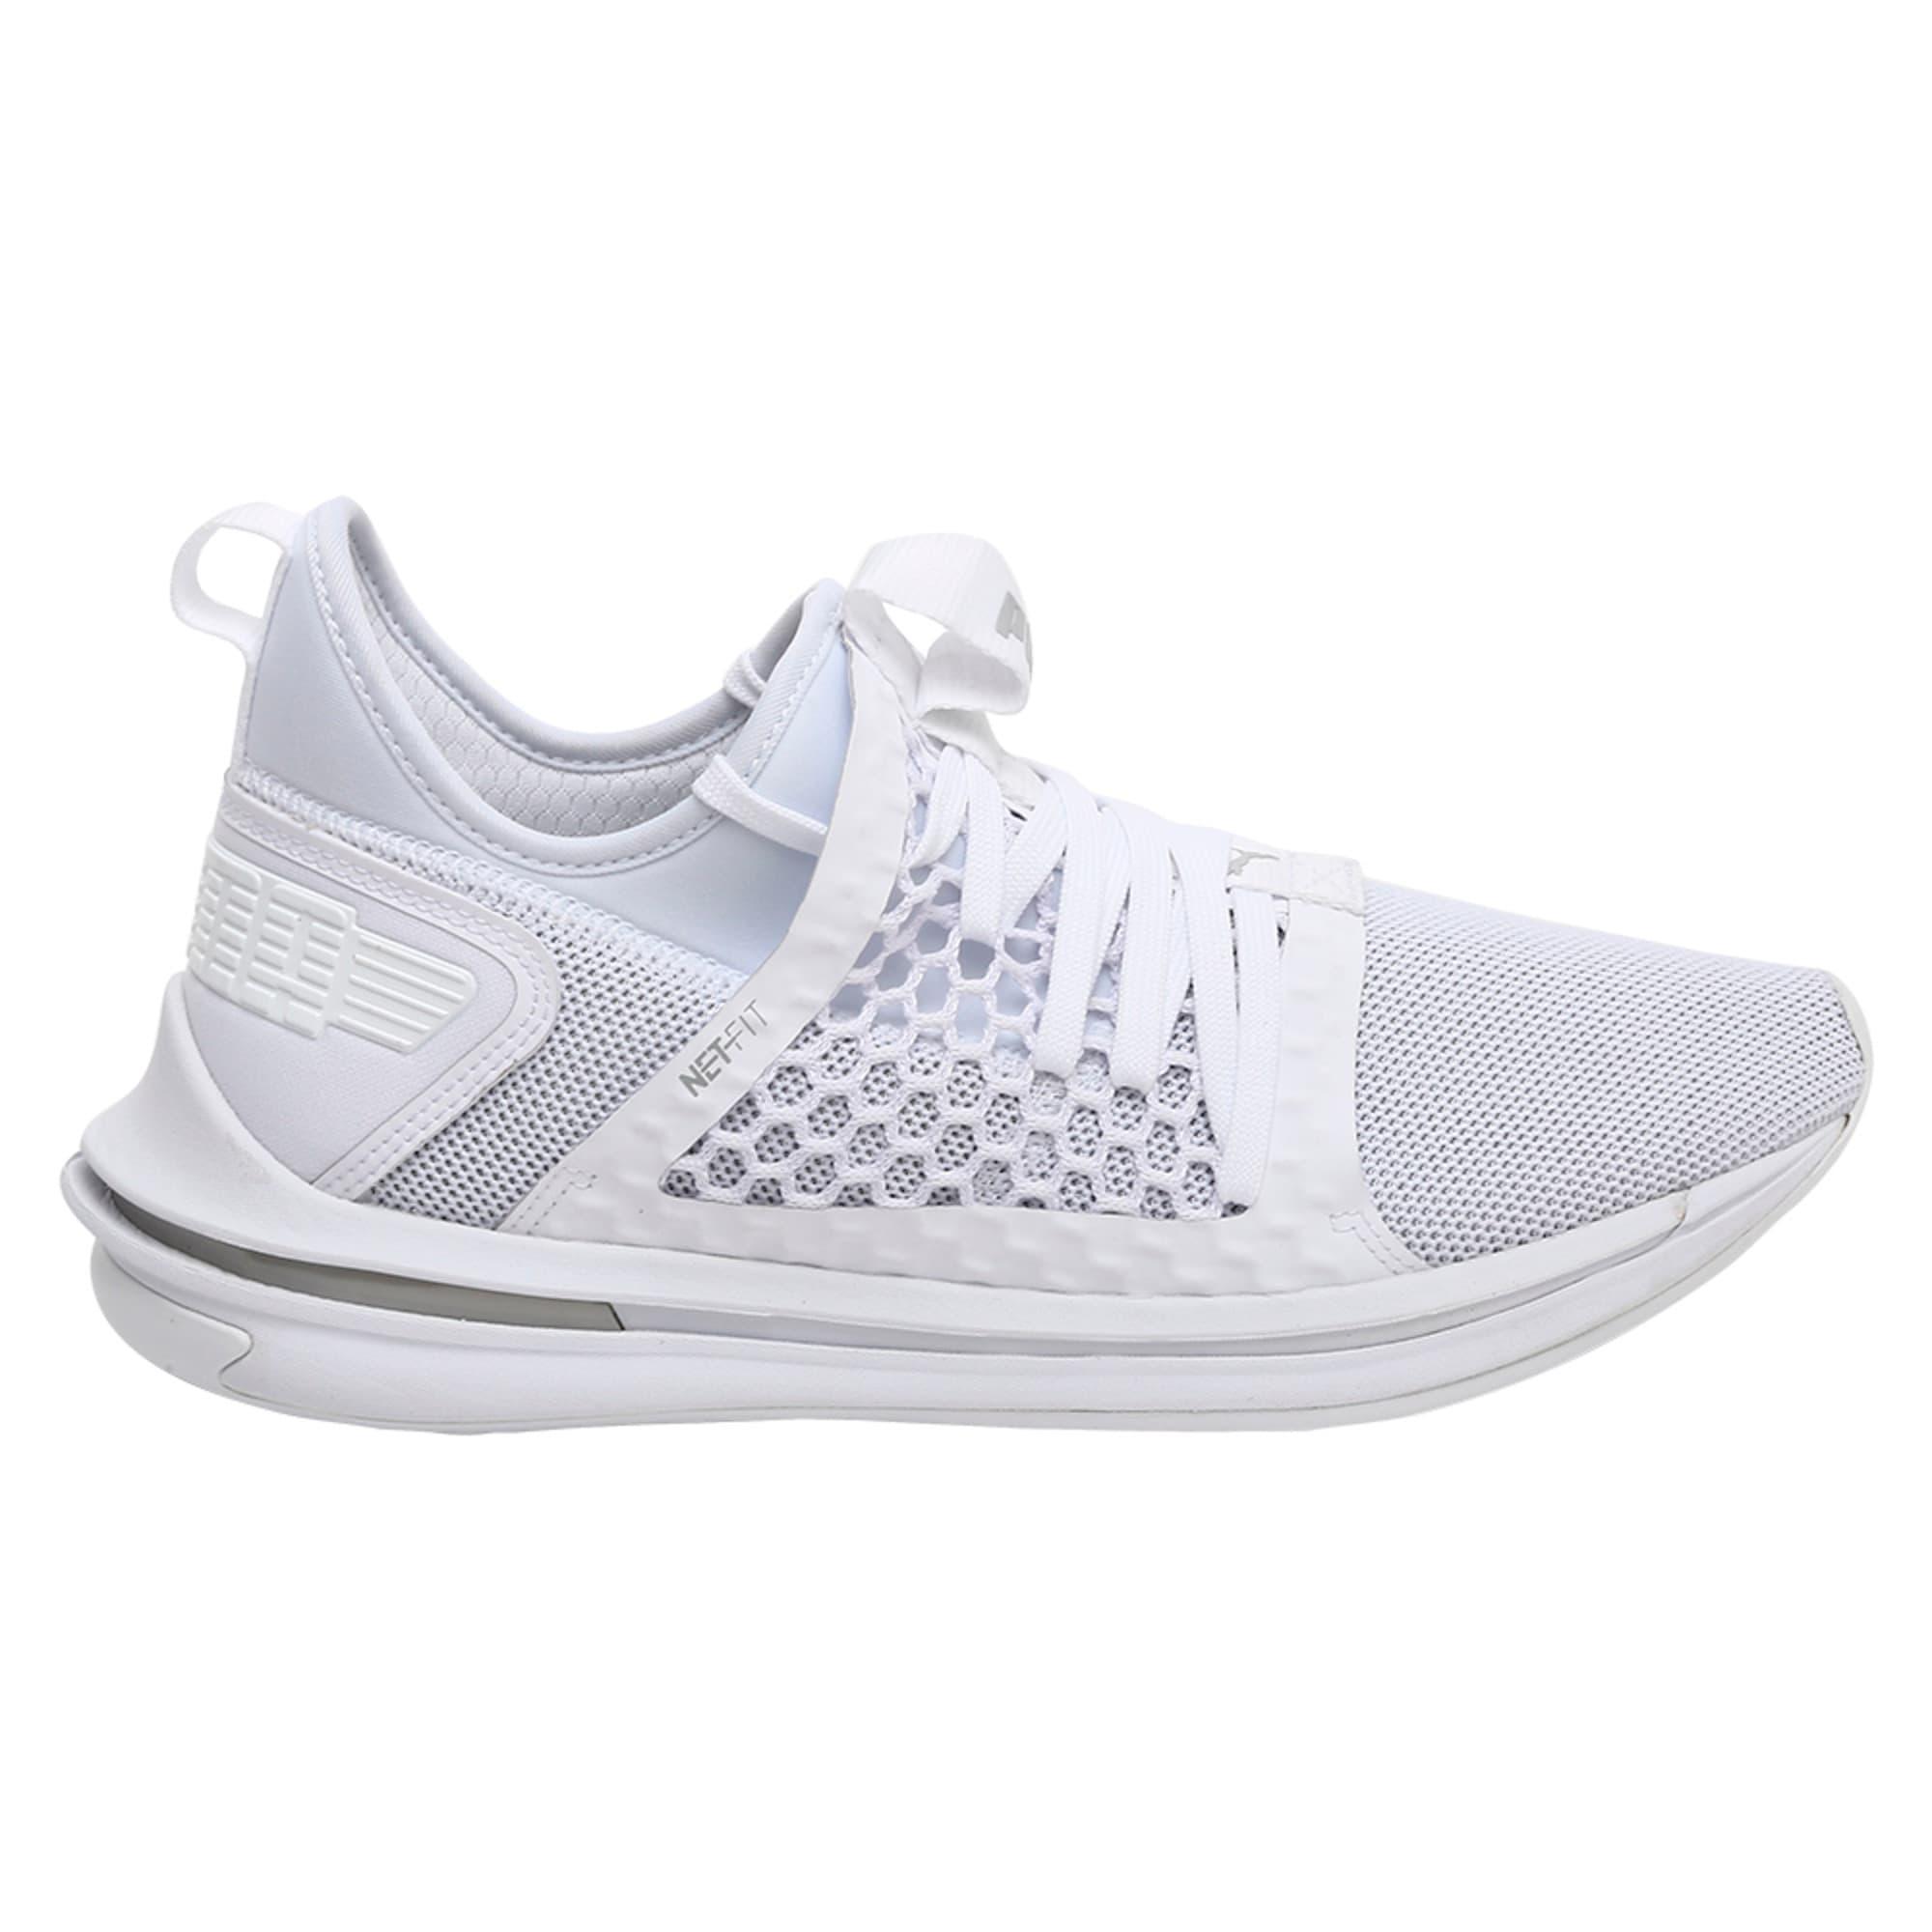 Thumbnail 3 of IGNITE Limitless SR NETFIT Men's Trainer Shoes, Puma White-Puma White, medium-IND